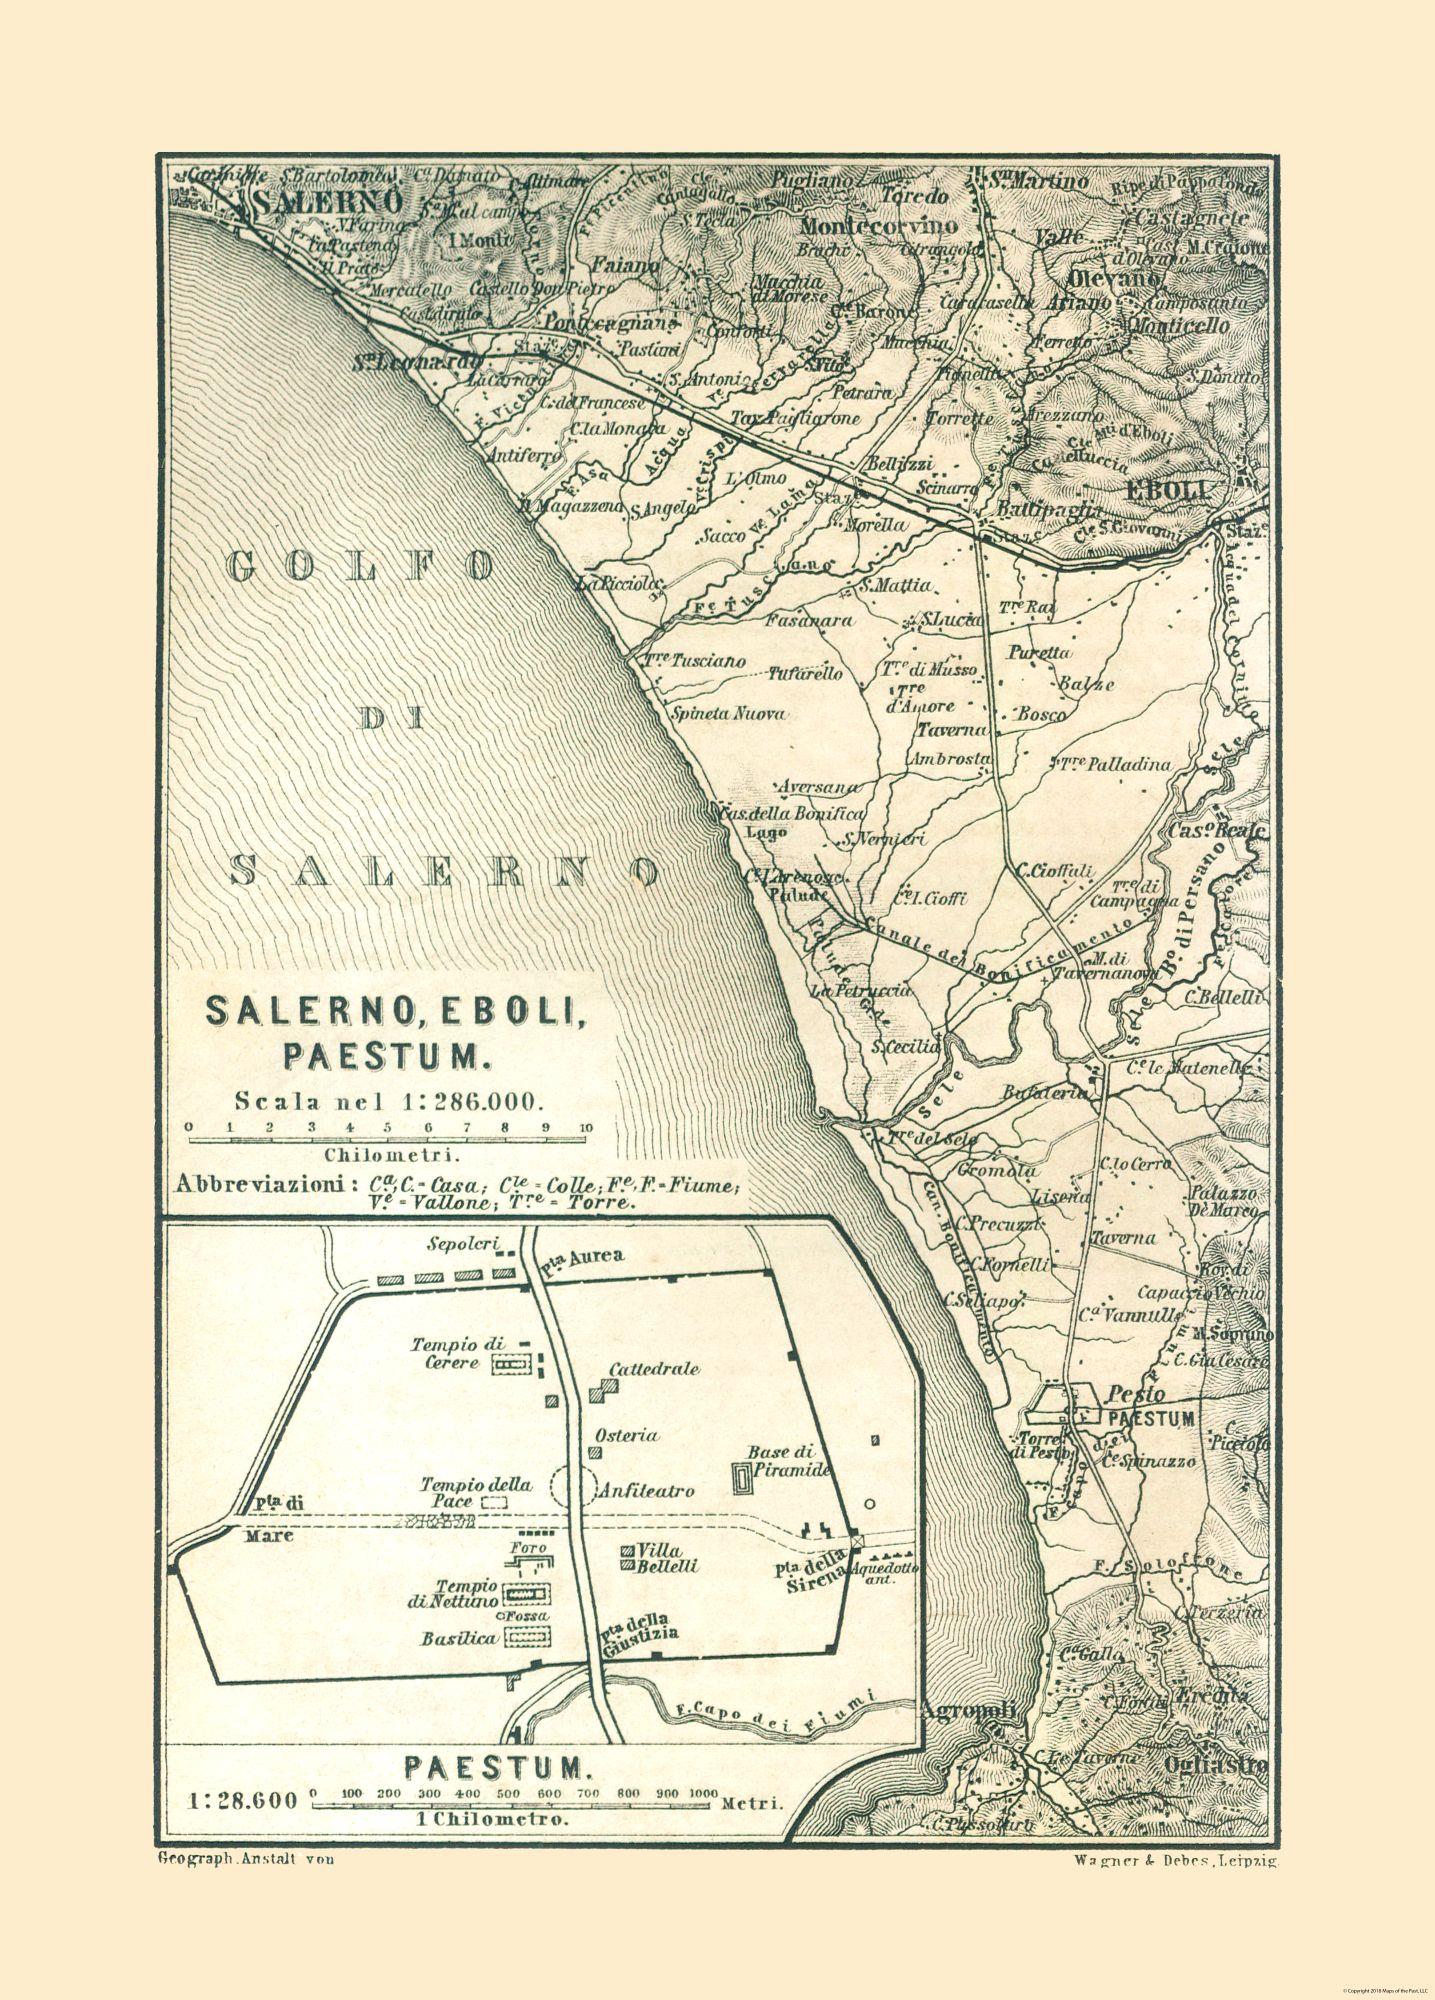 Old International Maps Salerno Eboli Paestrum Italy